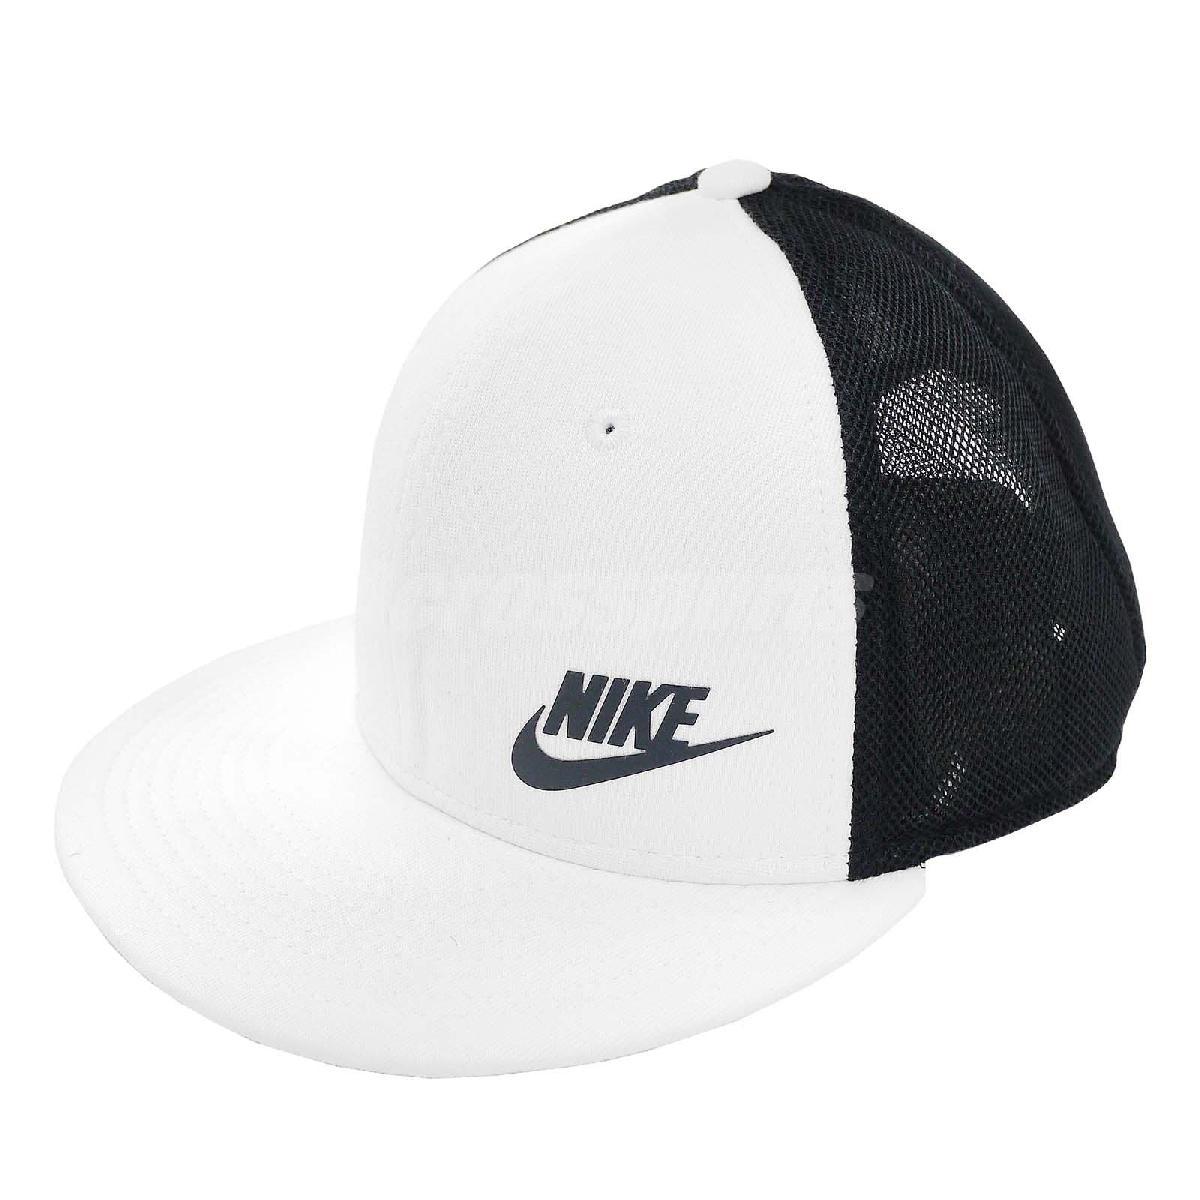 Nike帽子Tech Pack Snapback Cap白黑陰陽卡車帽棒球帽男女皆適合PUMP306 739418-100